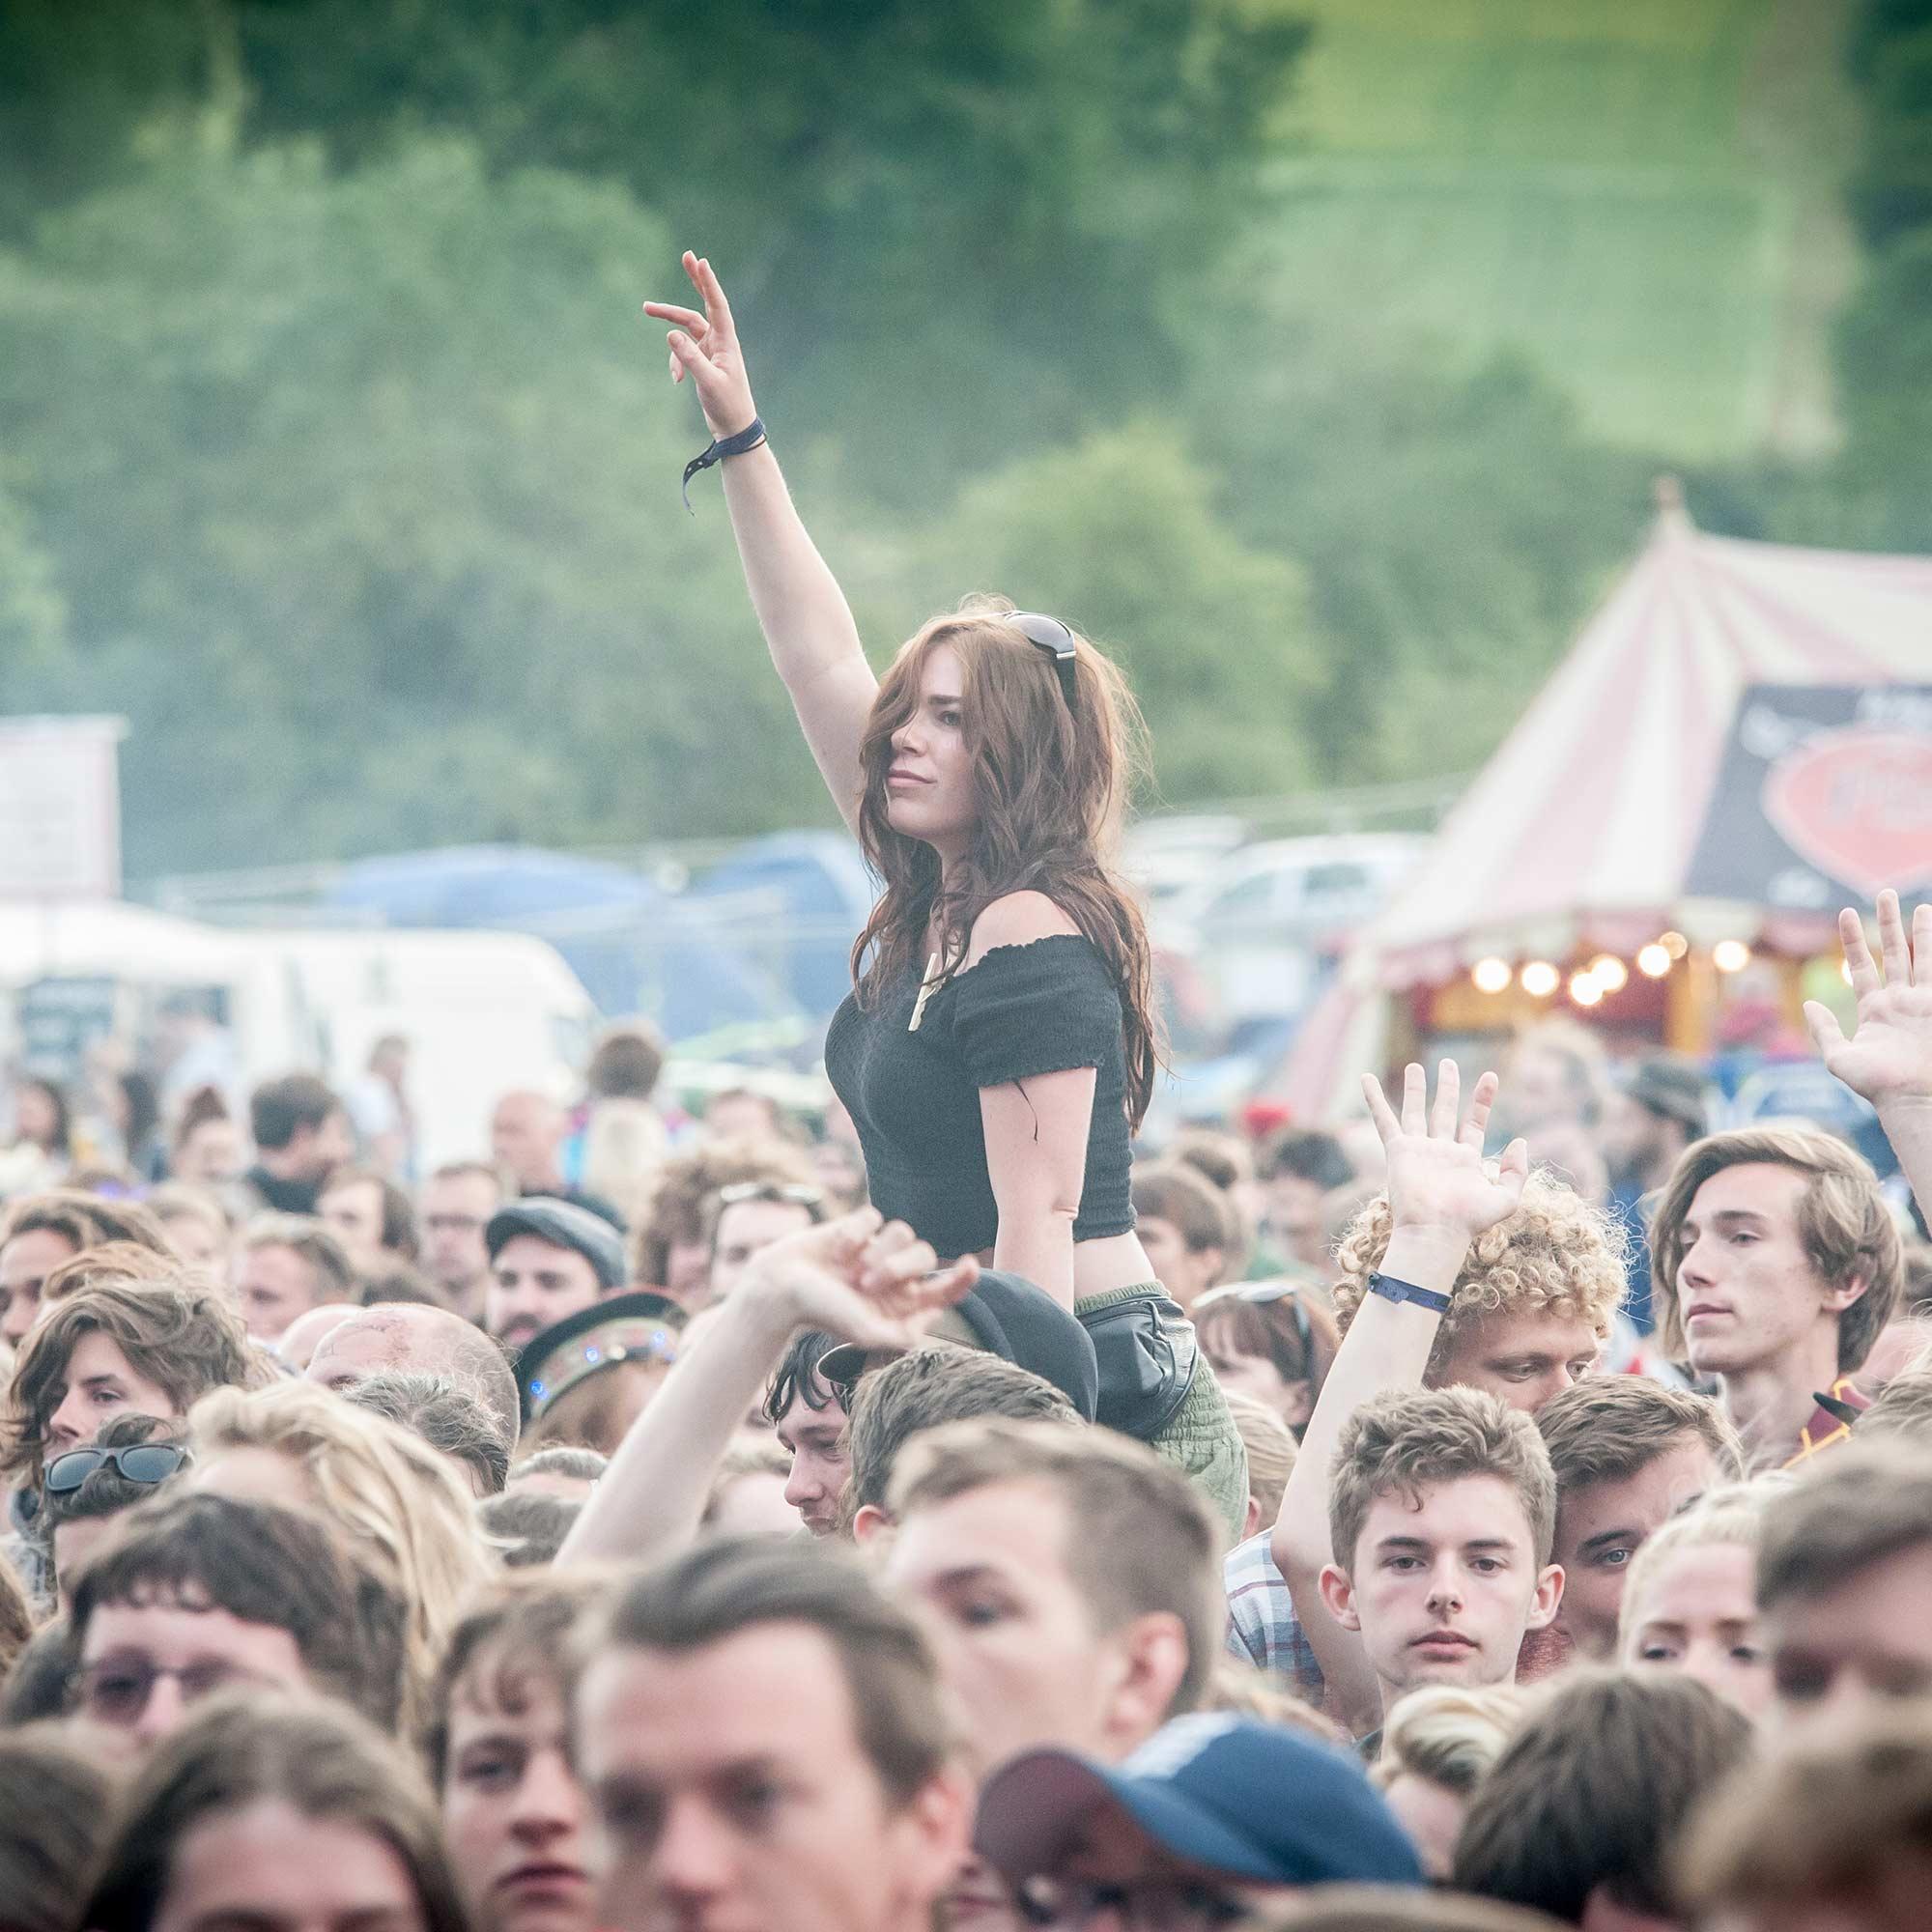 festival crowd outside